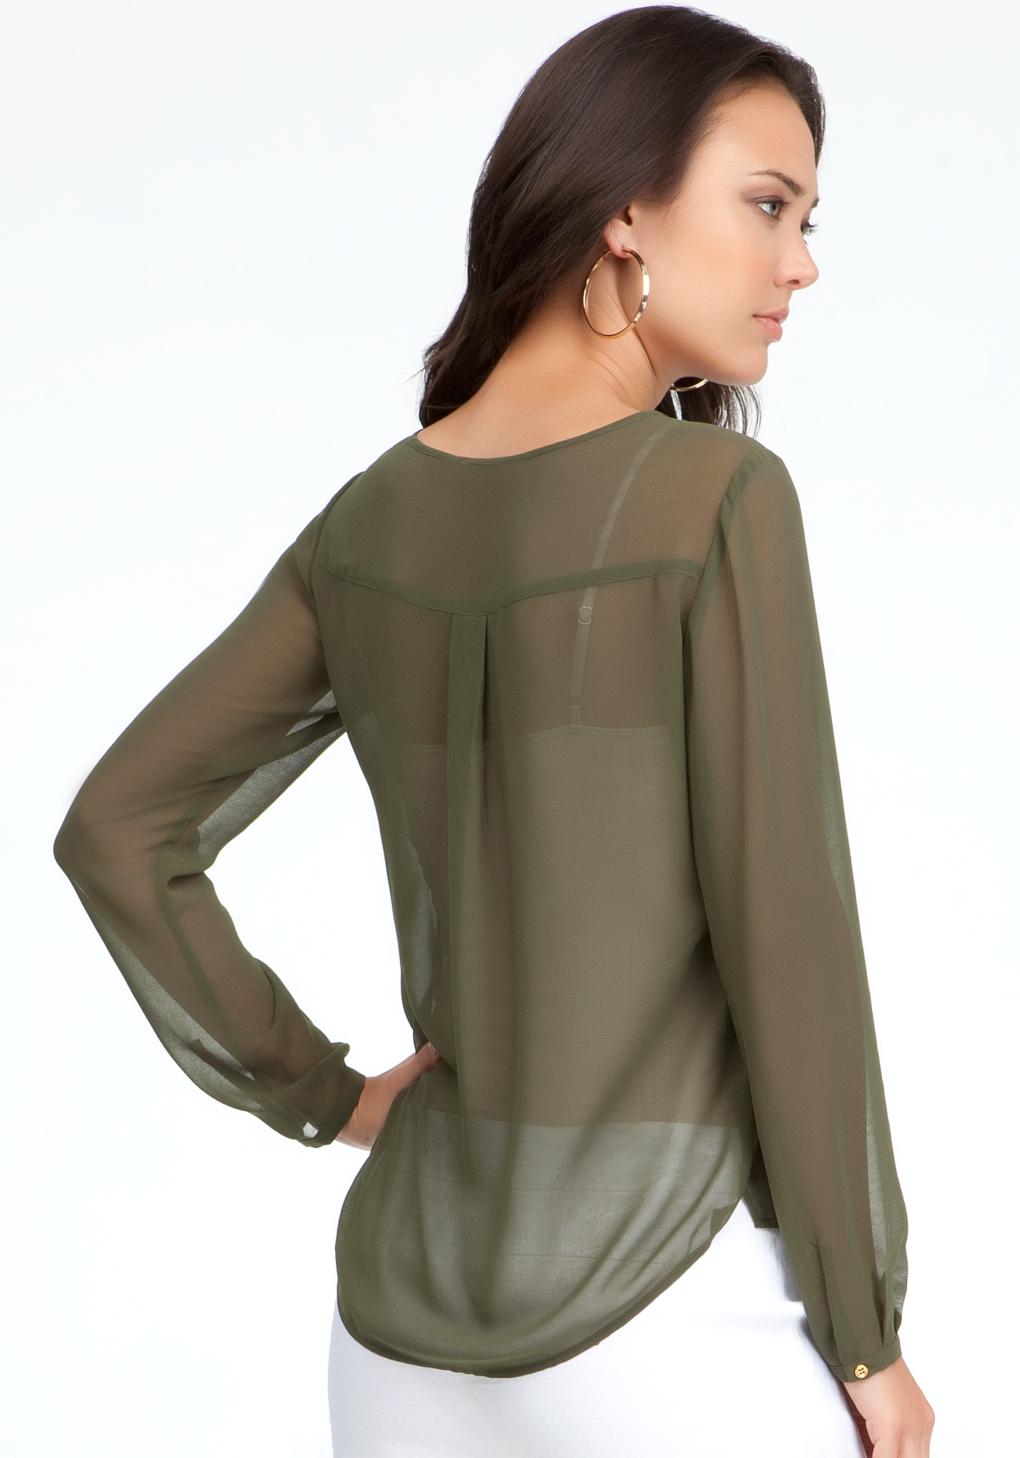 cc5124b7d2f97c Bebe Long Sleeve Sheer Blouse in Green - Lyst